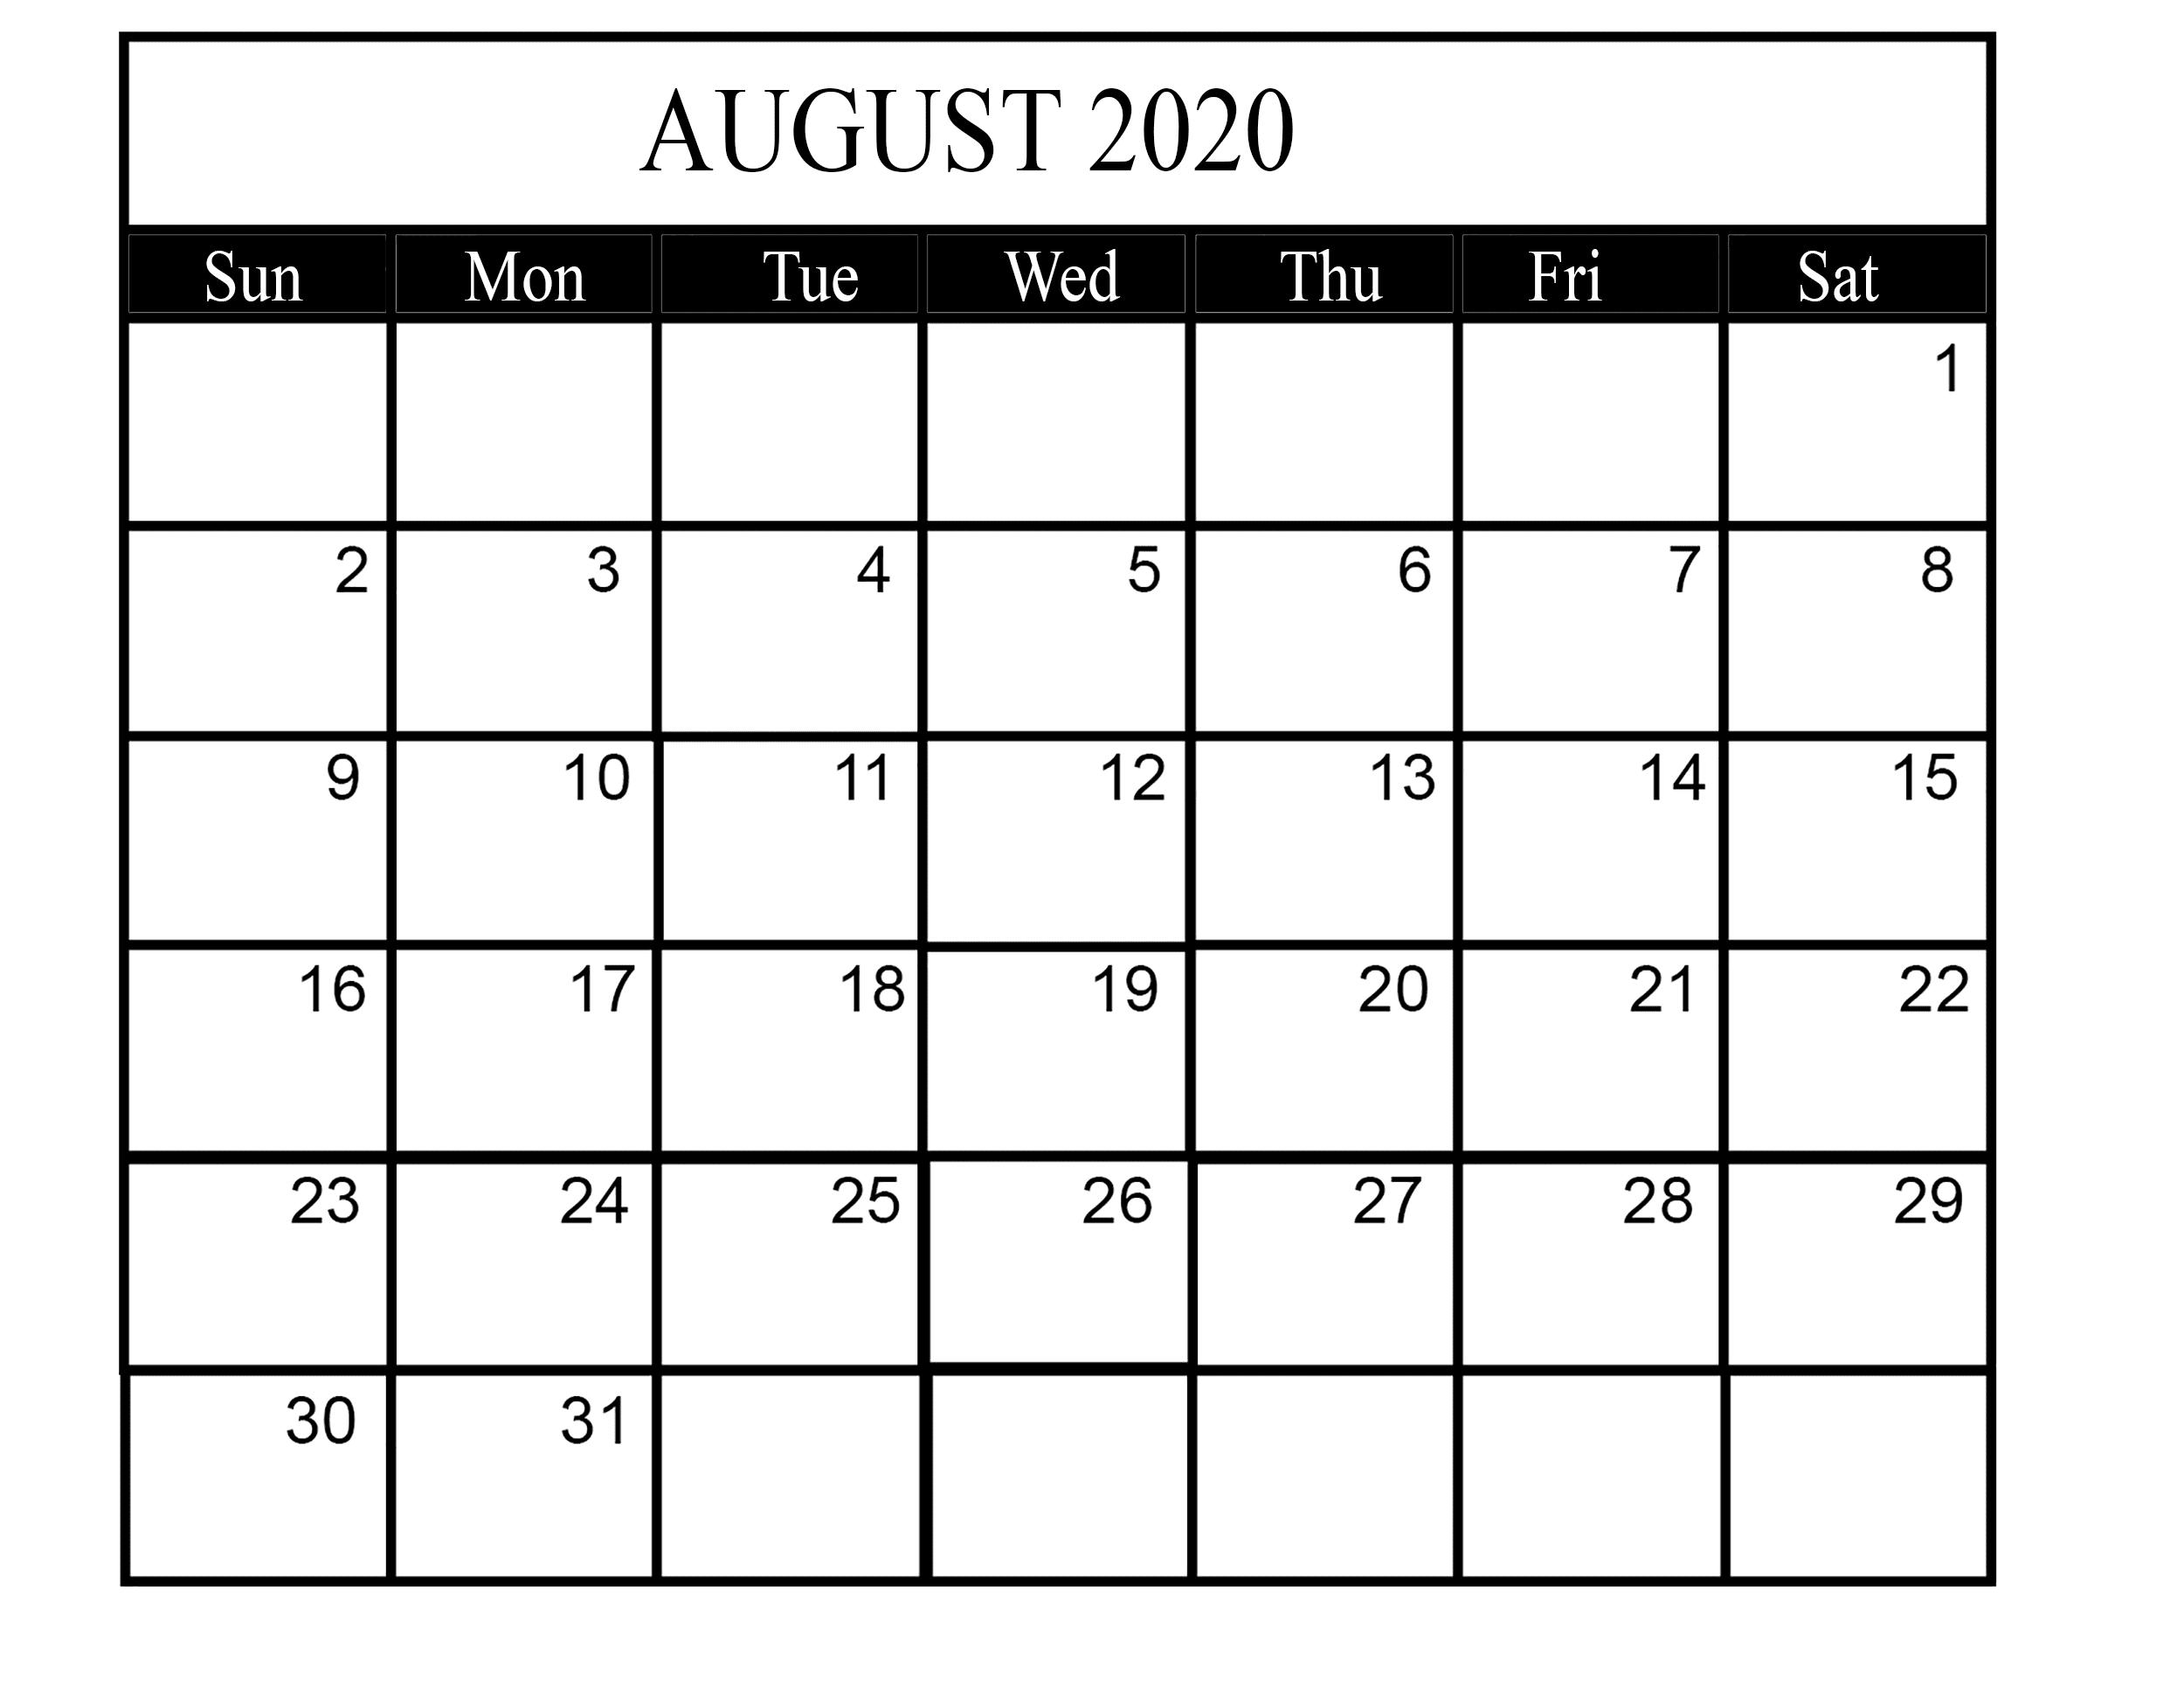 August 2020 Weekly Calendar Template